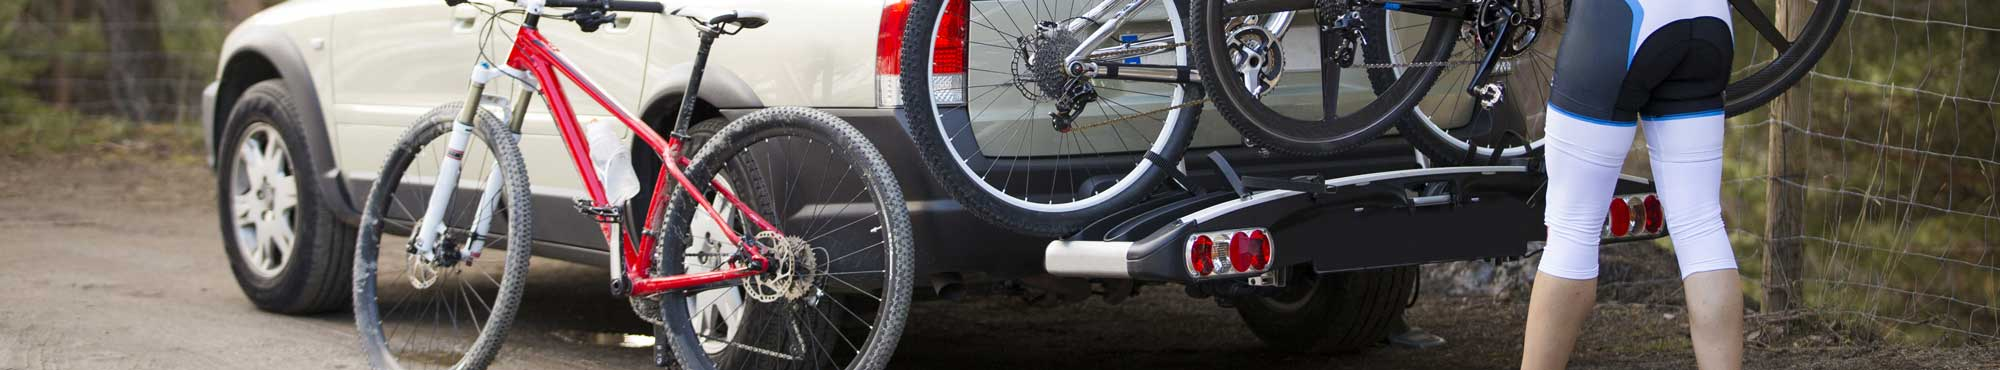 bike-towbar-header